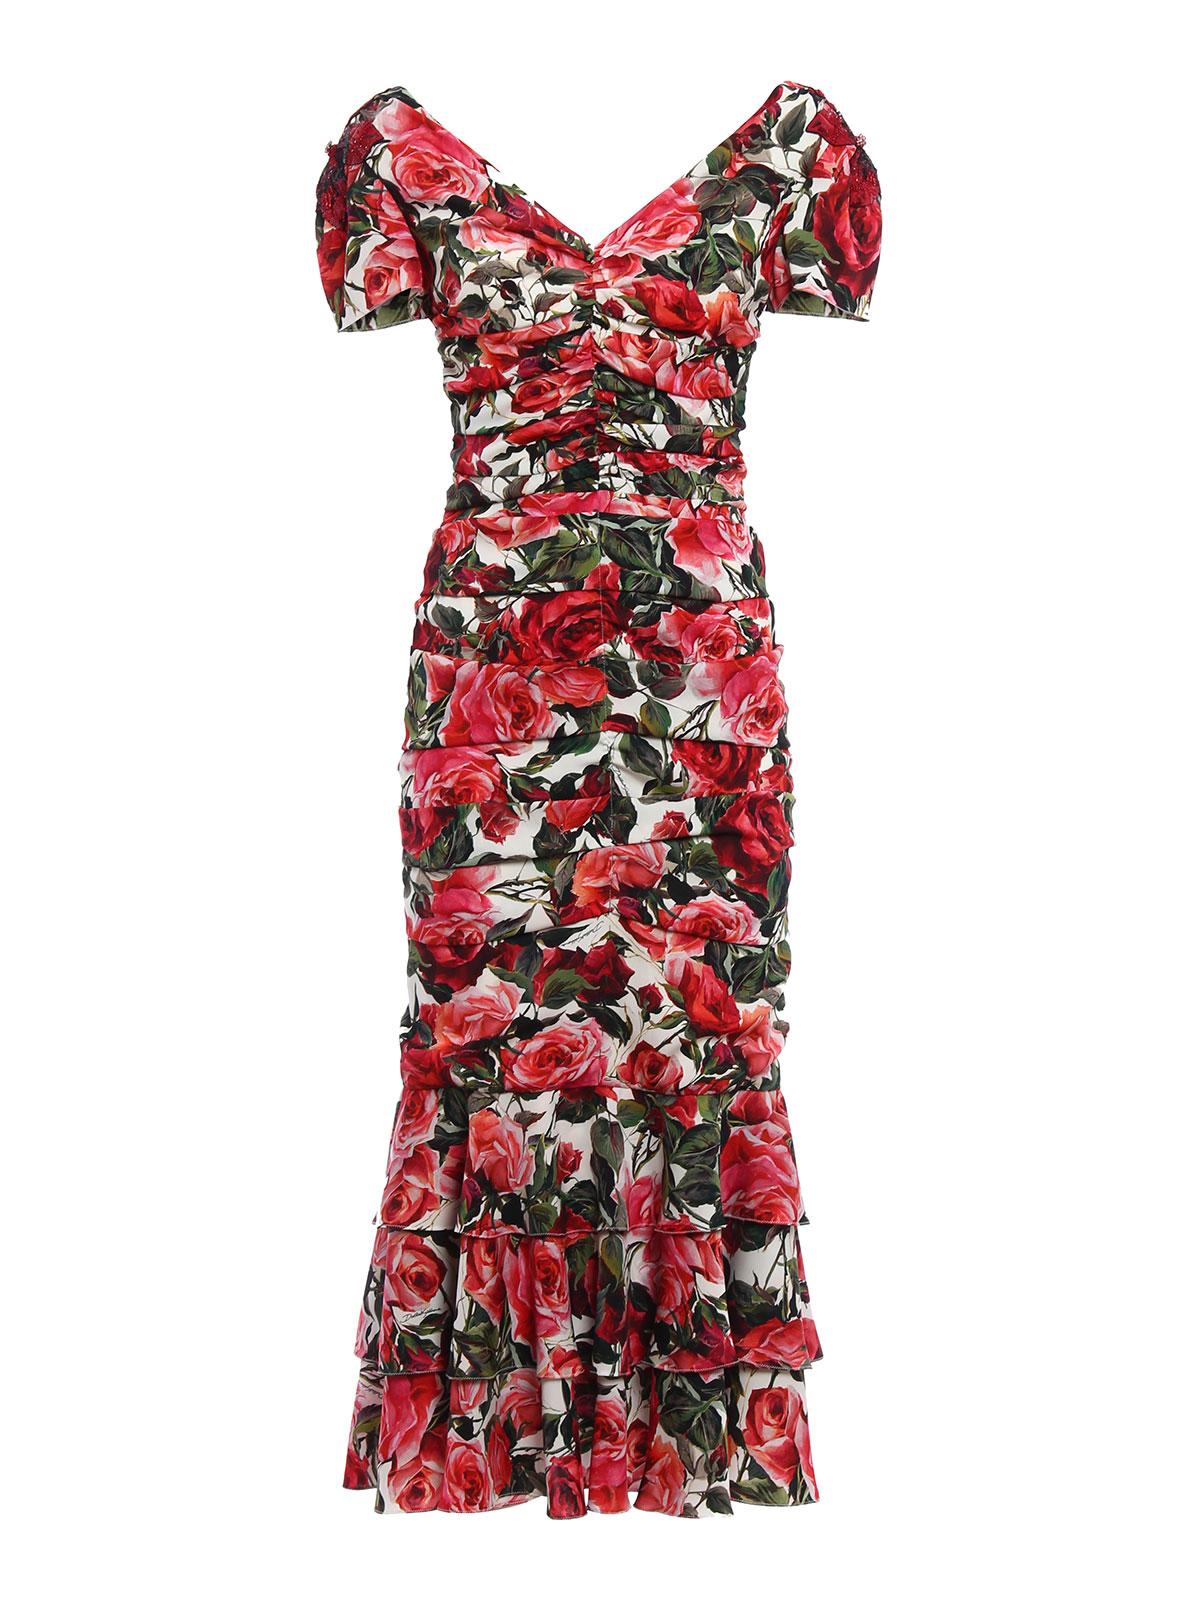 Silk sheath cocktail dress